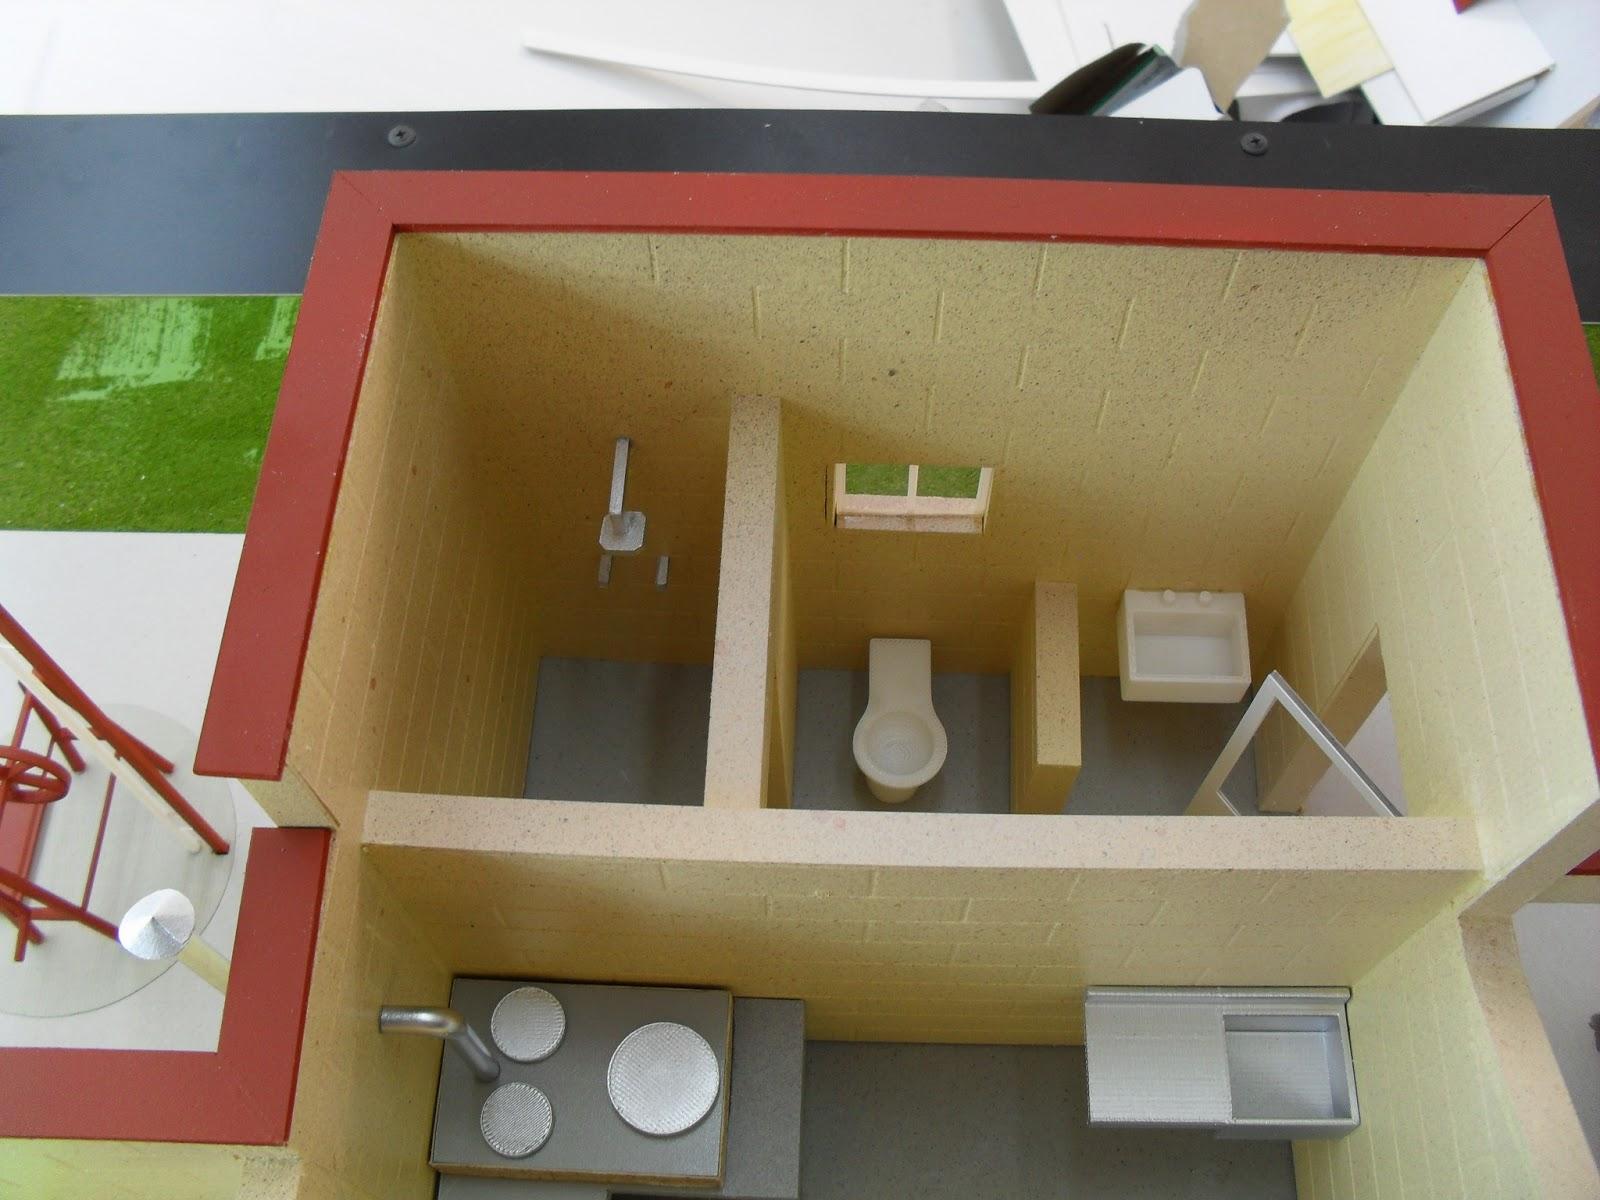 Fotos de maquetas de casas infantiles septiembre 2014 - Maquetas de chalets ...